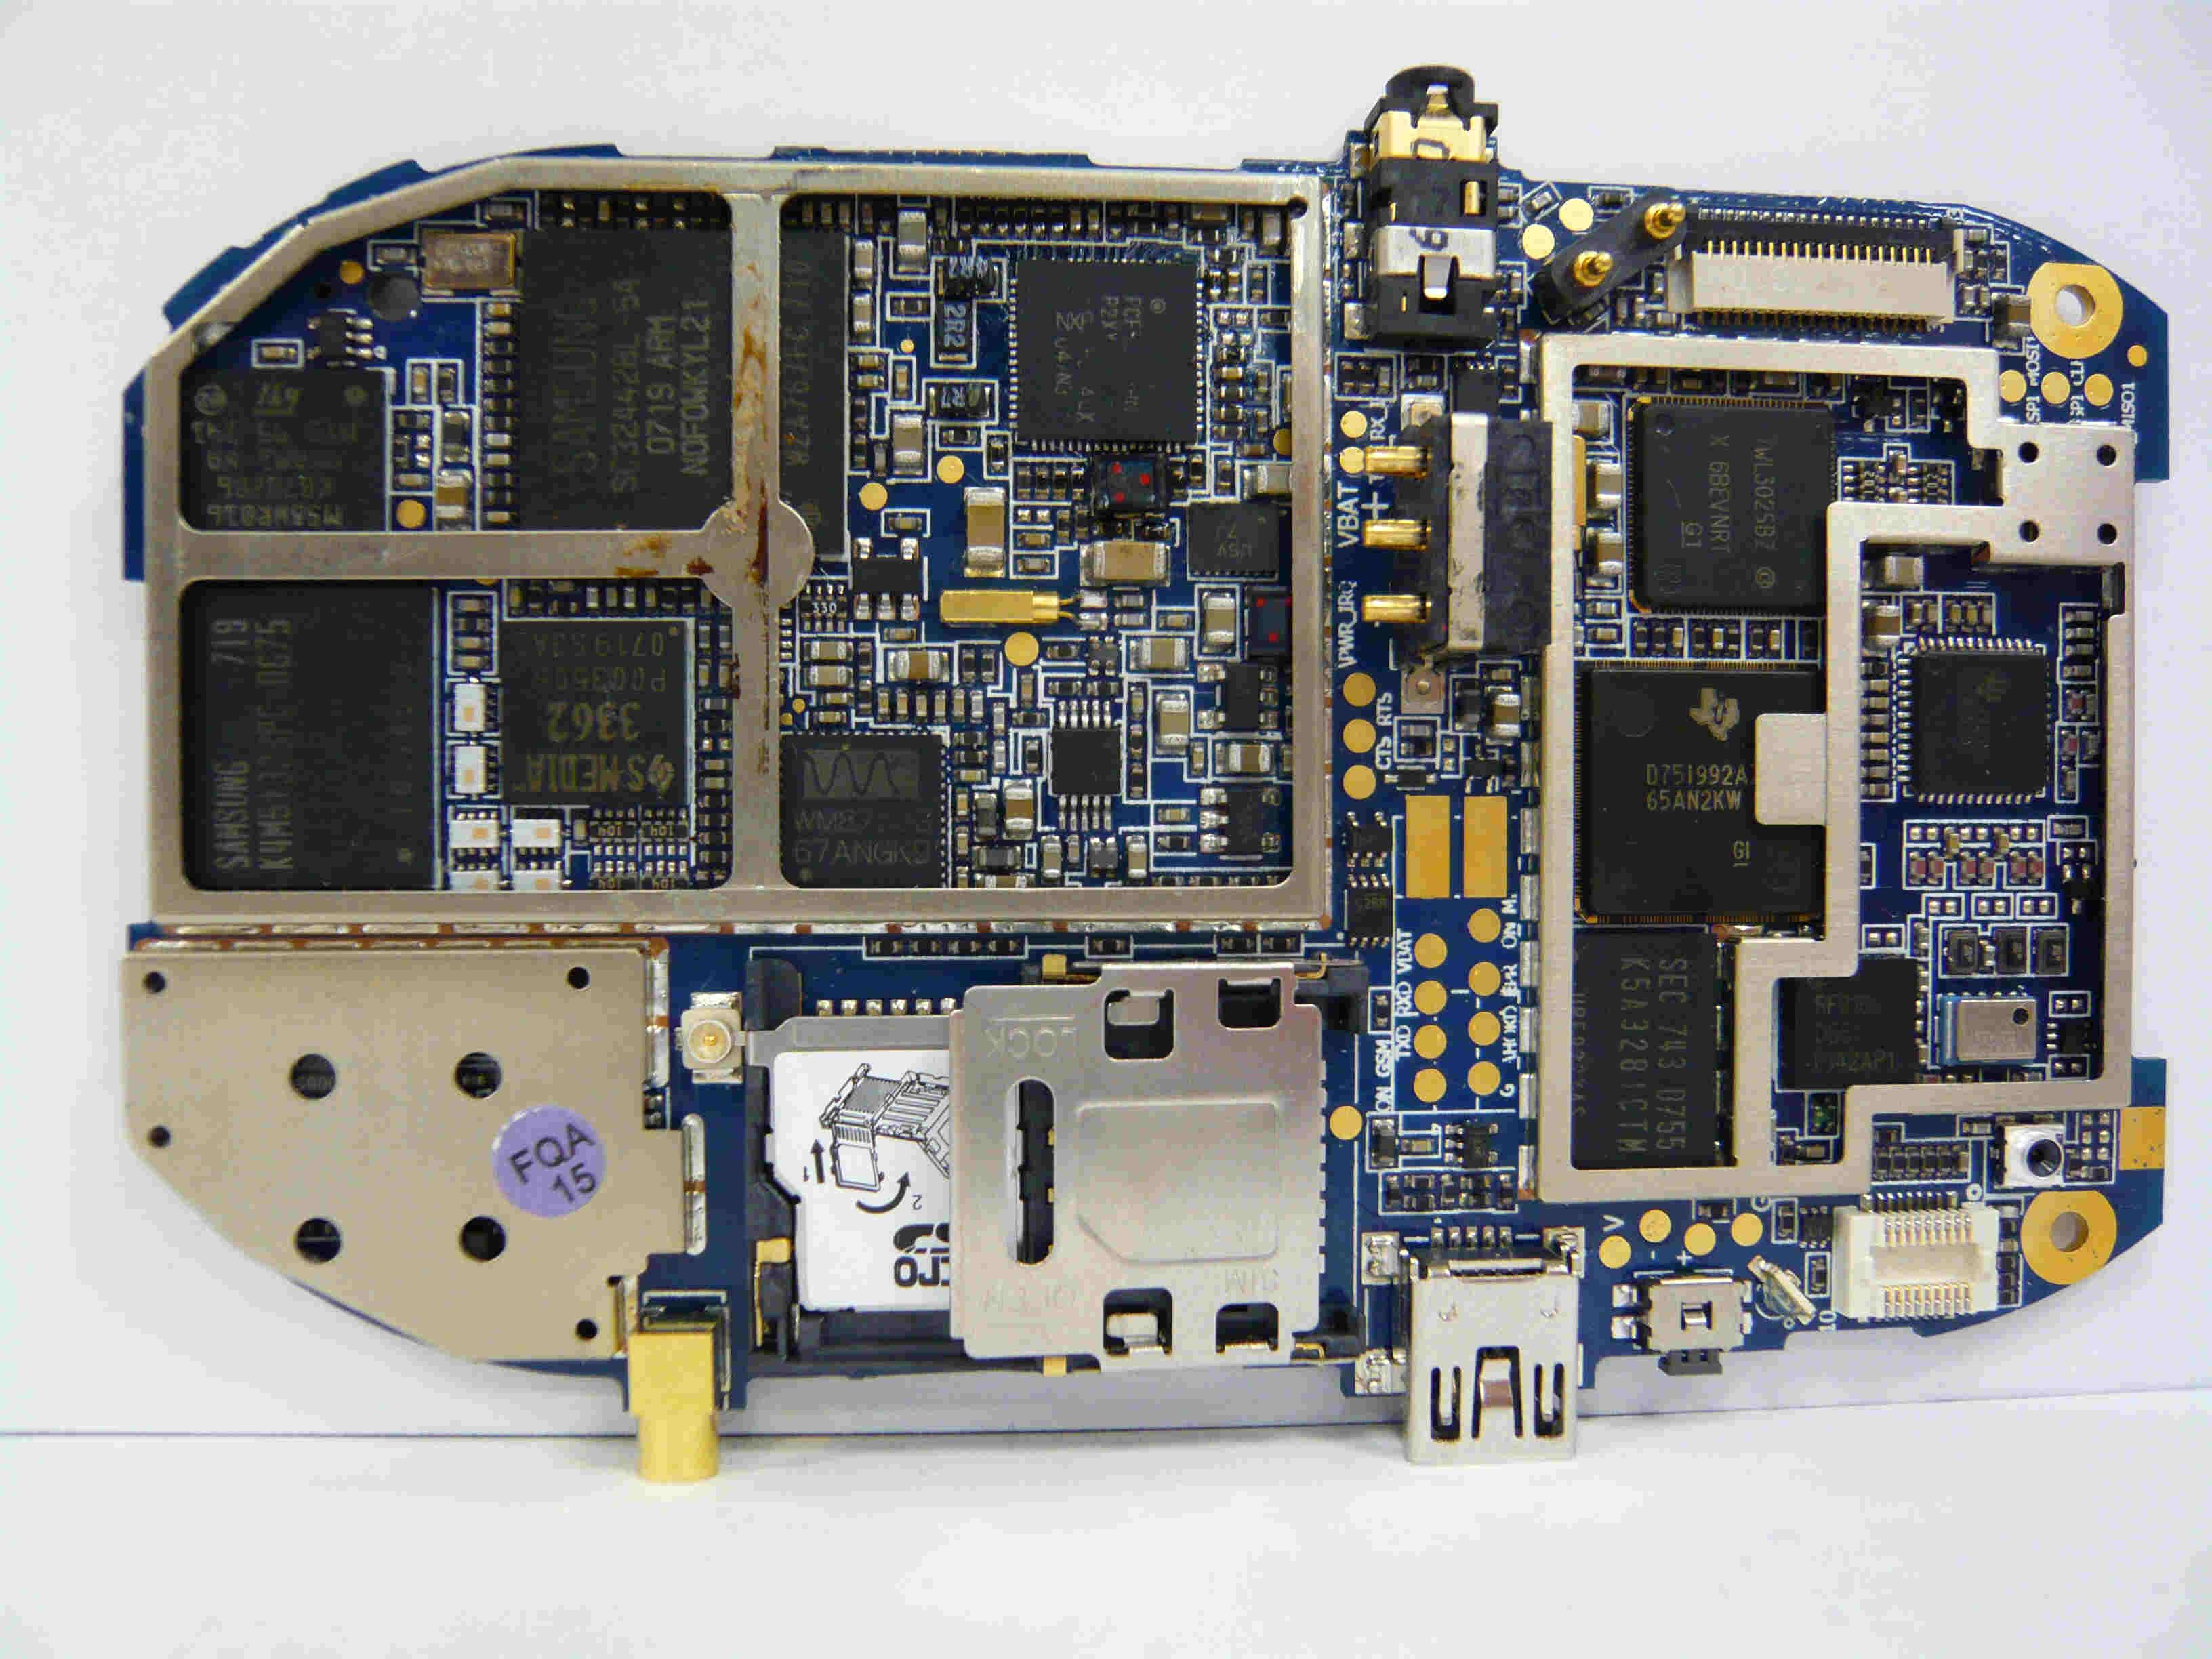 Index of /openmoko/certificate/gta/gta02/hardware/GTA02/A5/